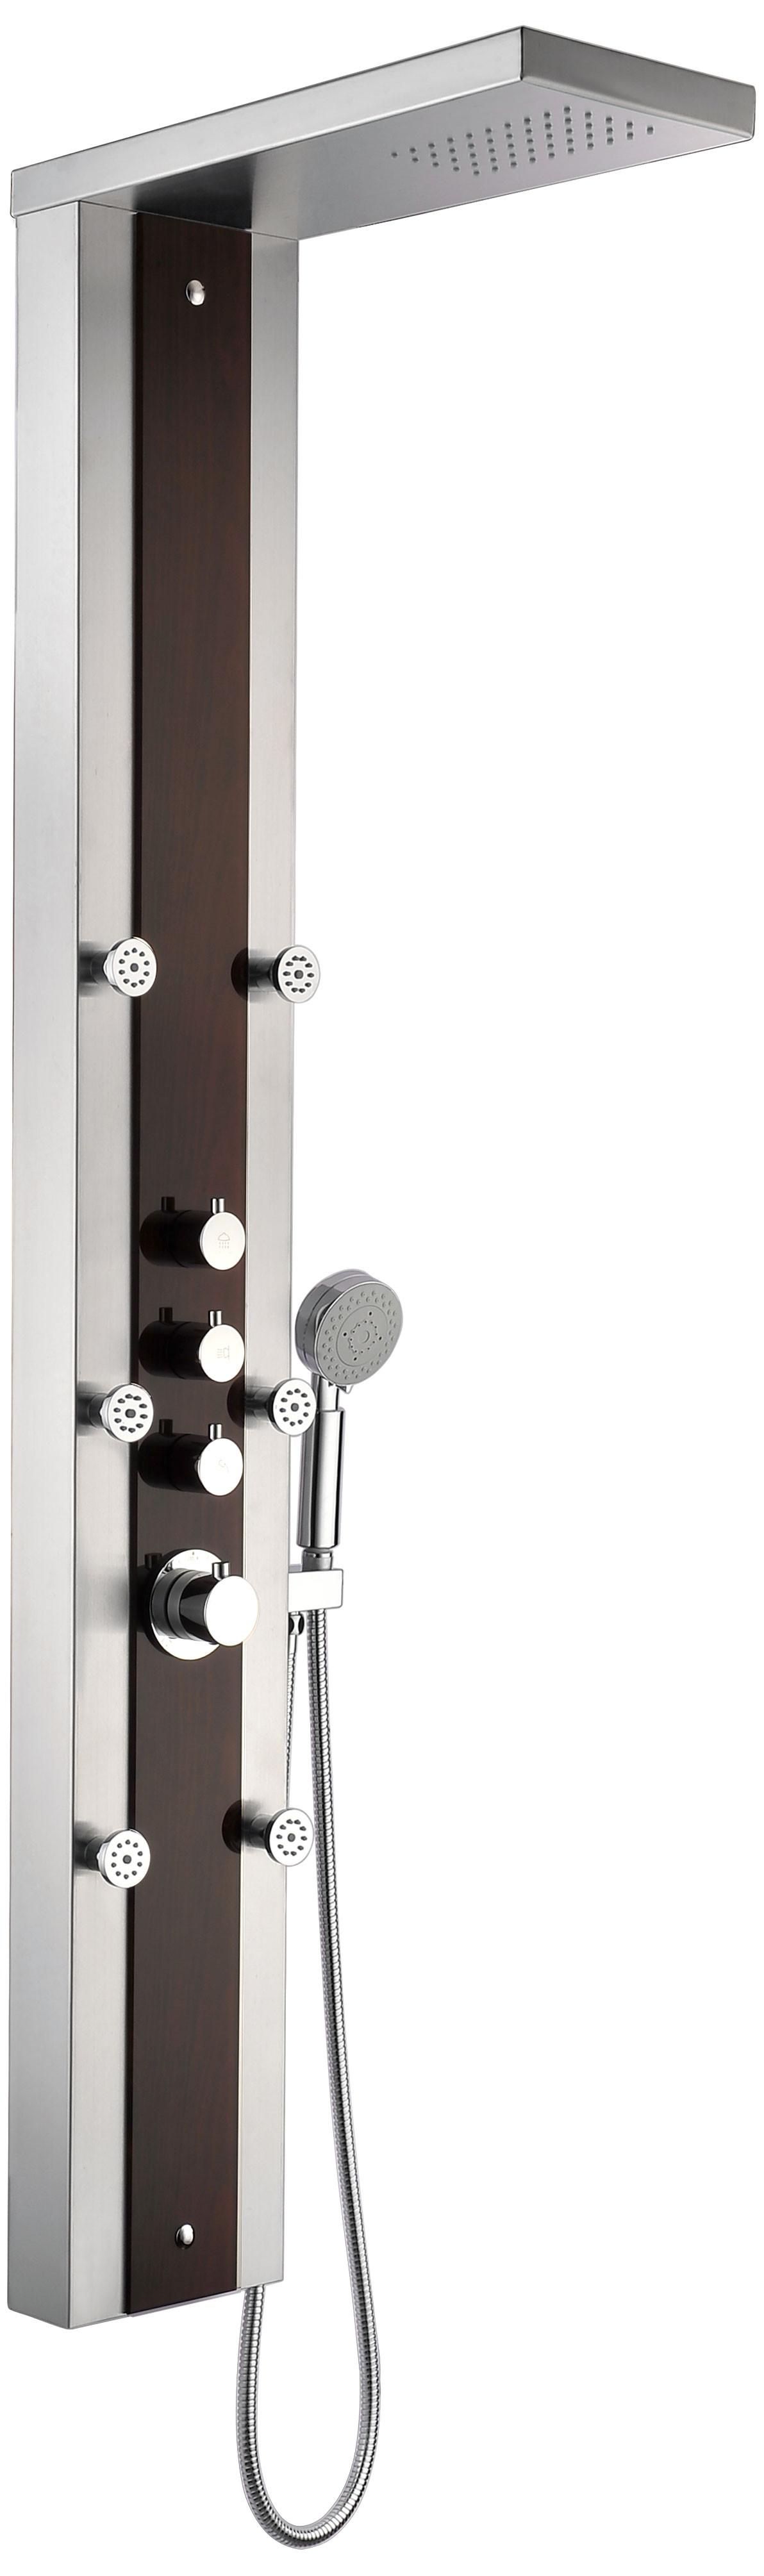 ANZZI SP-AZ013 Kiki Shower Panel With Rain Shower In Rich Mahogany Styled